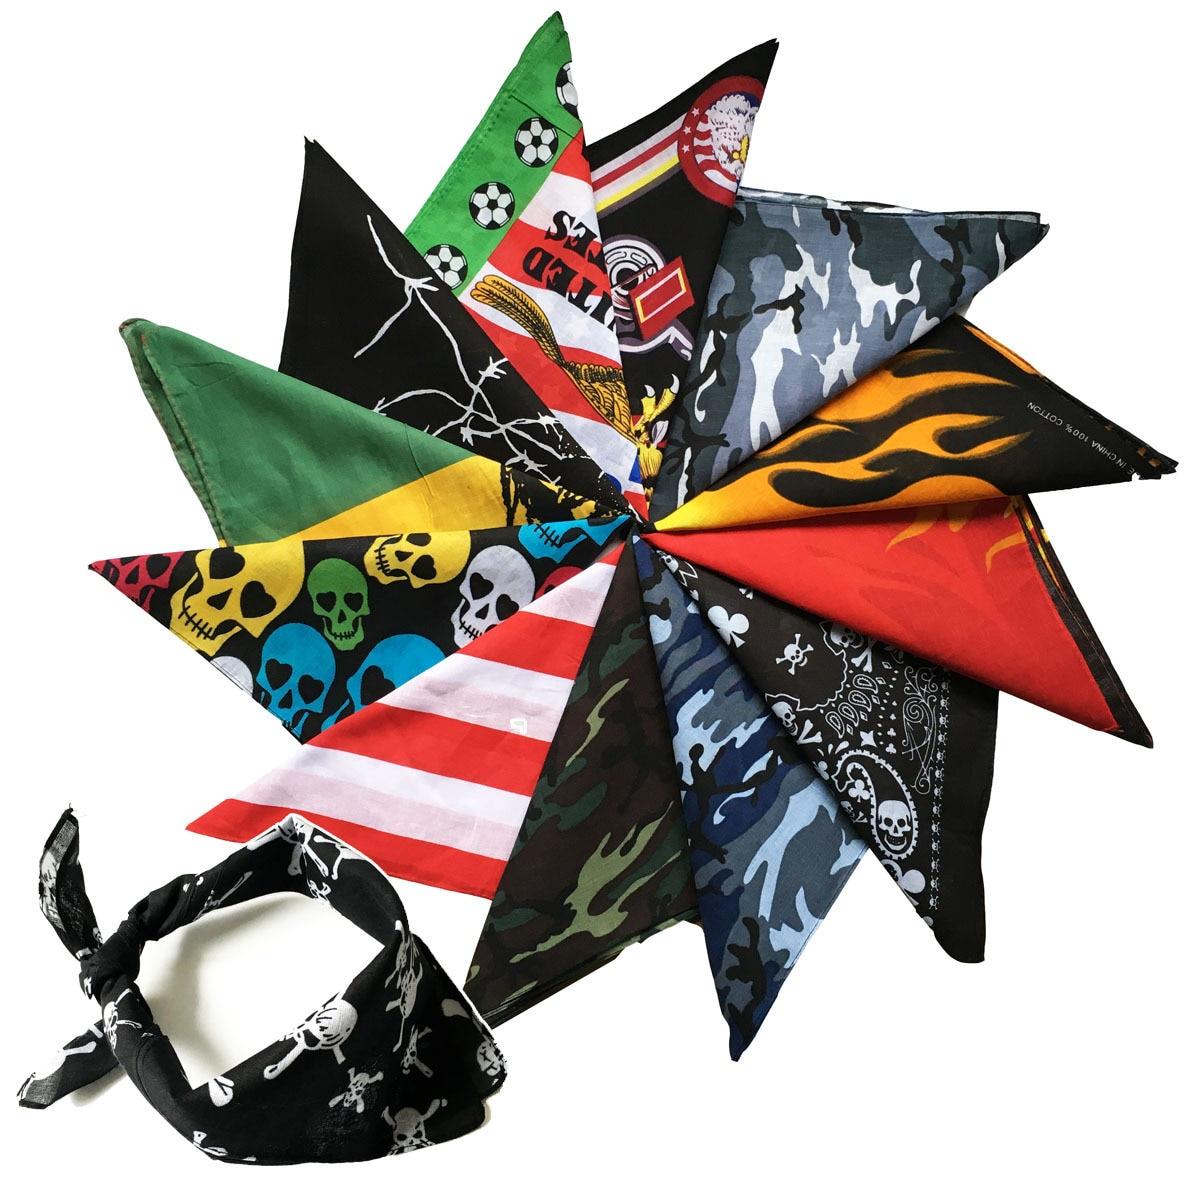 100% Cotton  Hip Hop Skull  Black Paisley Bandana Bandanna Headwear/Hair Band Scarf Neck Wrist Wrap Band Headtie For Women/Mens